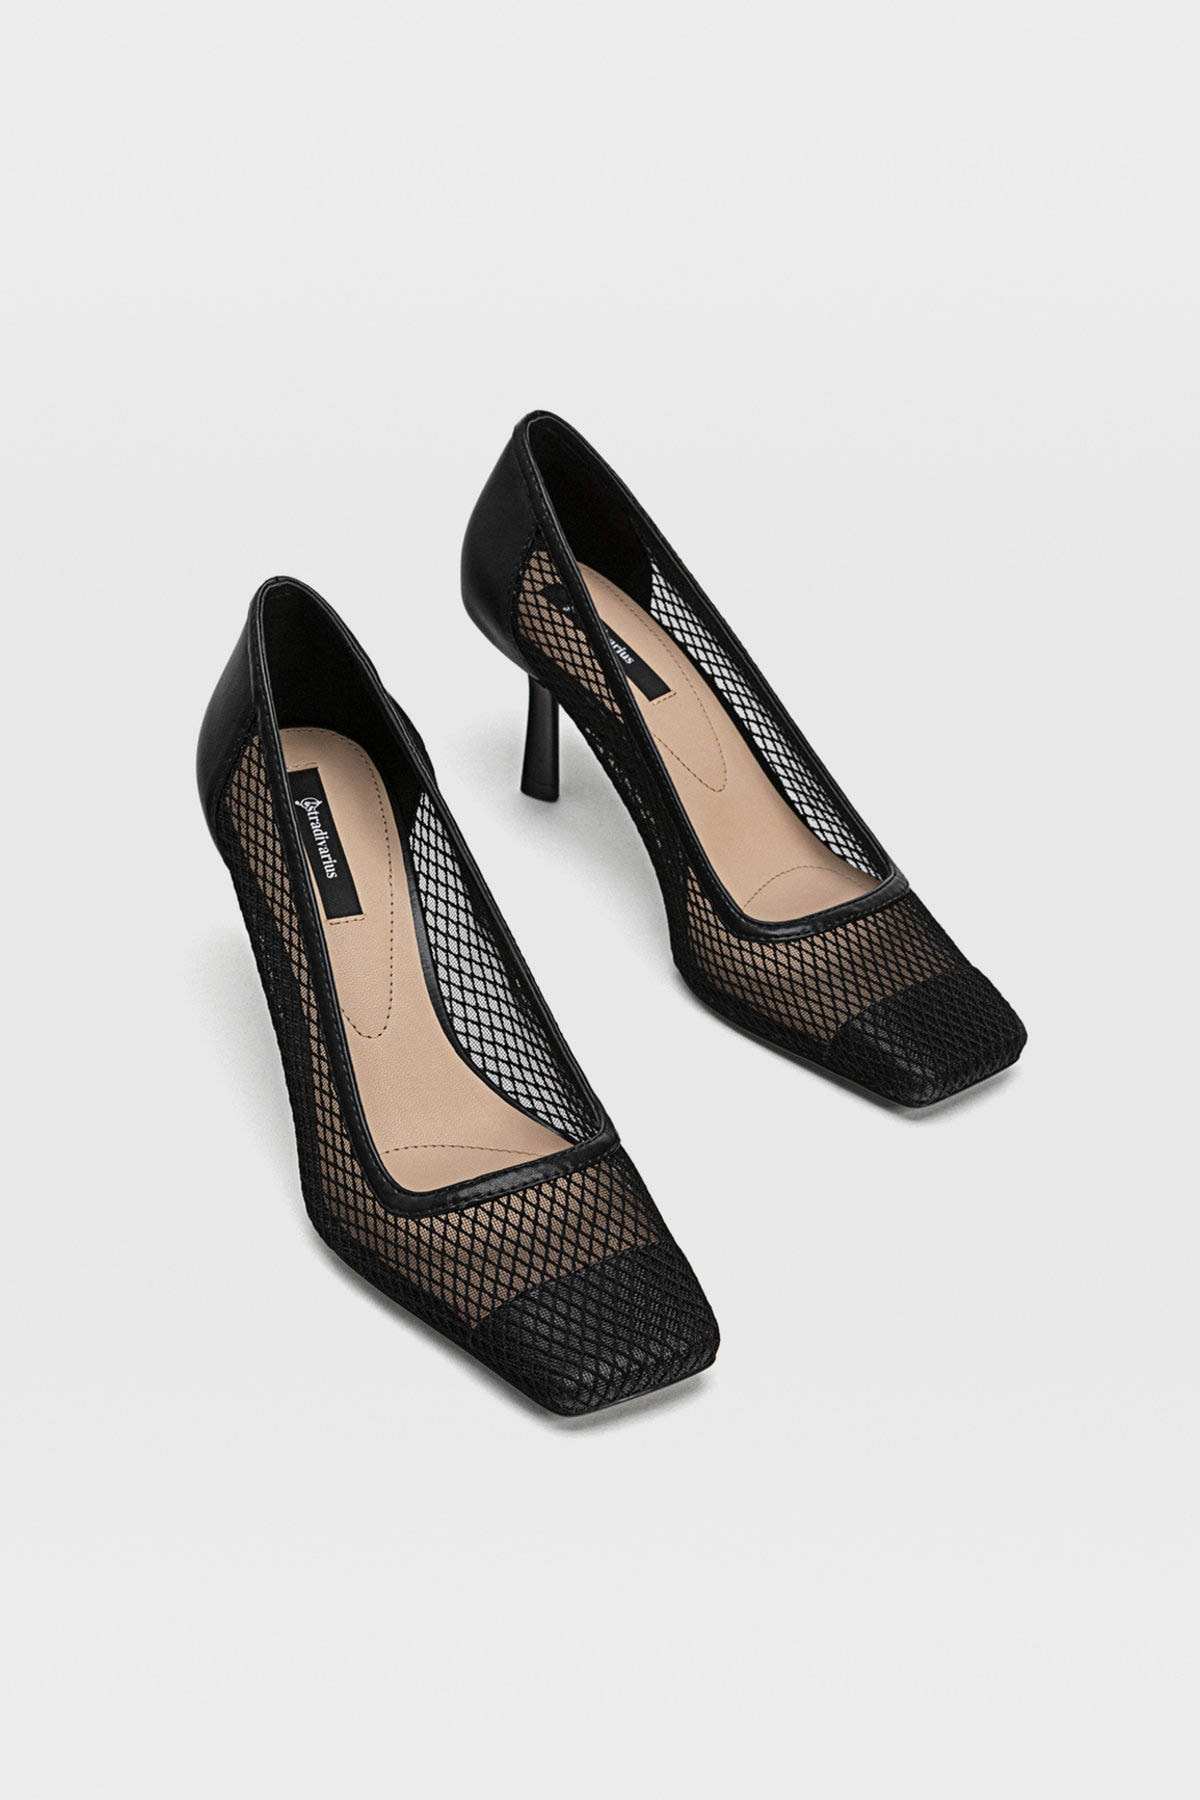 Stradivarius Kadın Siyah Fileli Yüksek Topuklu Ayakkabı 19657670 2